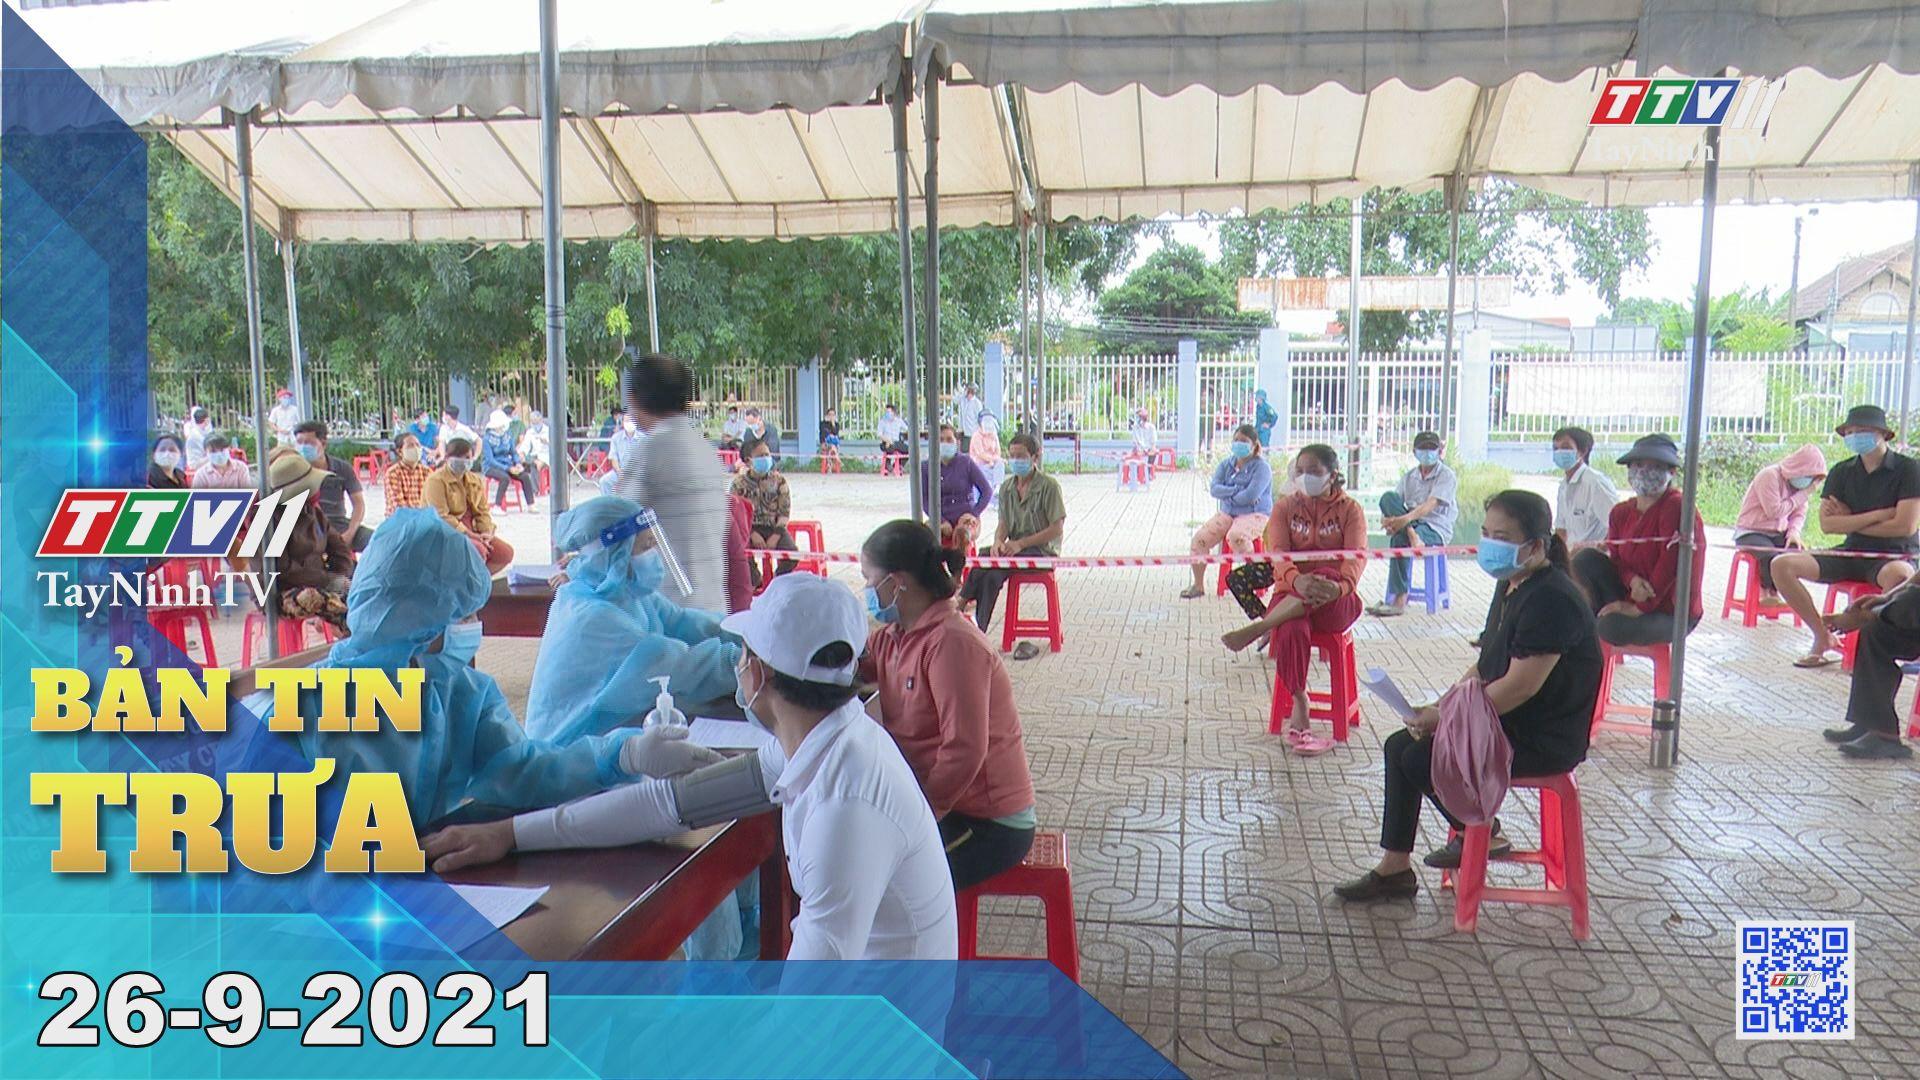 Bản tin trưa 26/9/2021 | Tin tức hôm nay | TayNinhTV